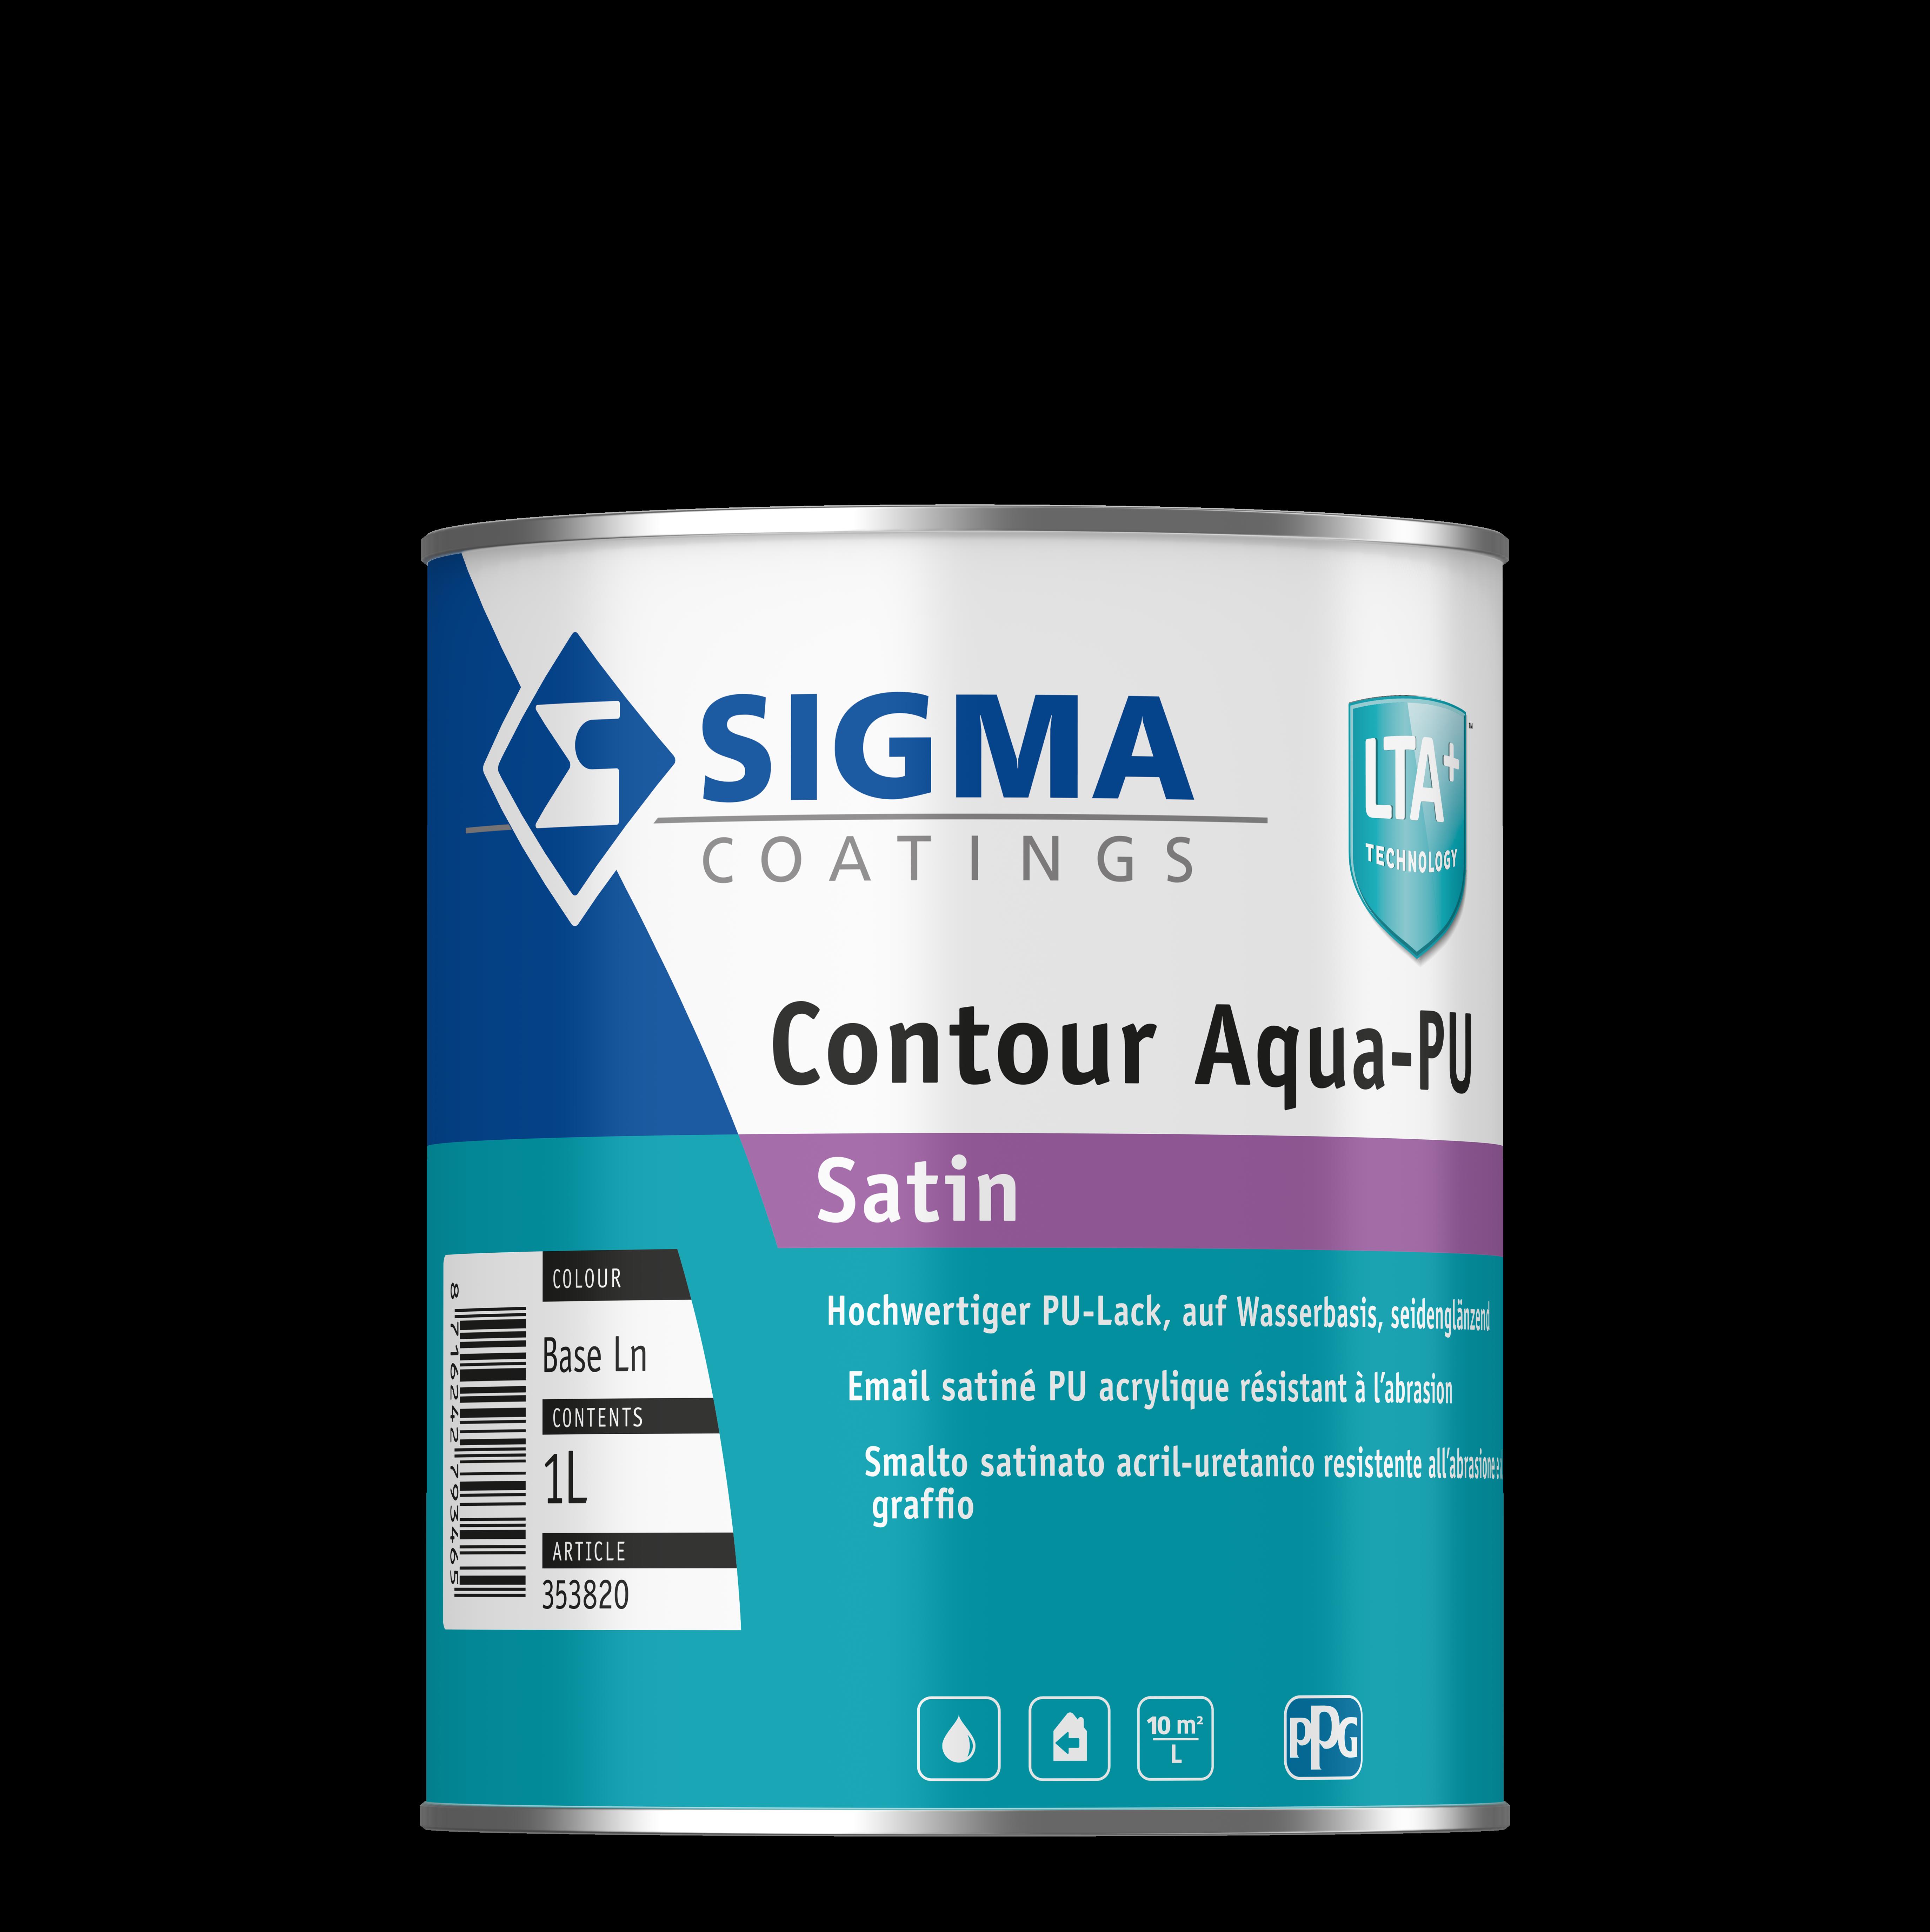 Sigma Contour Aqua-PU Satin